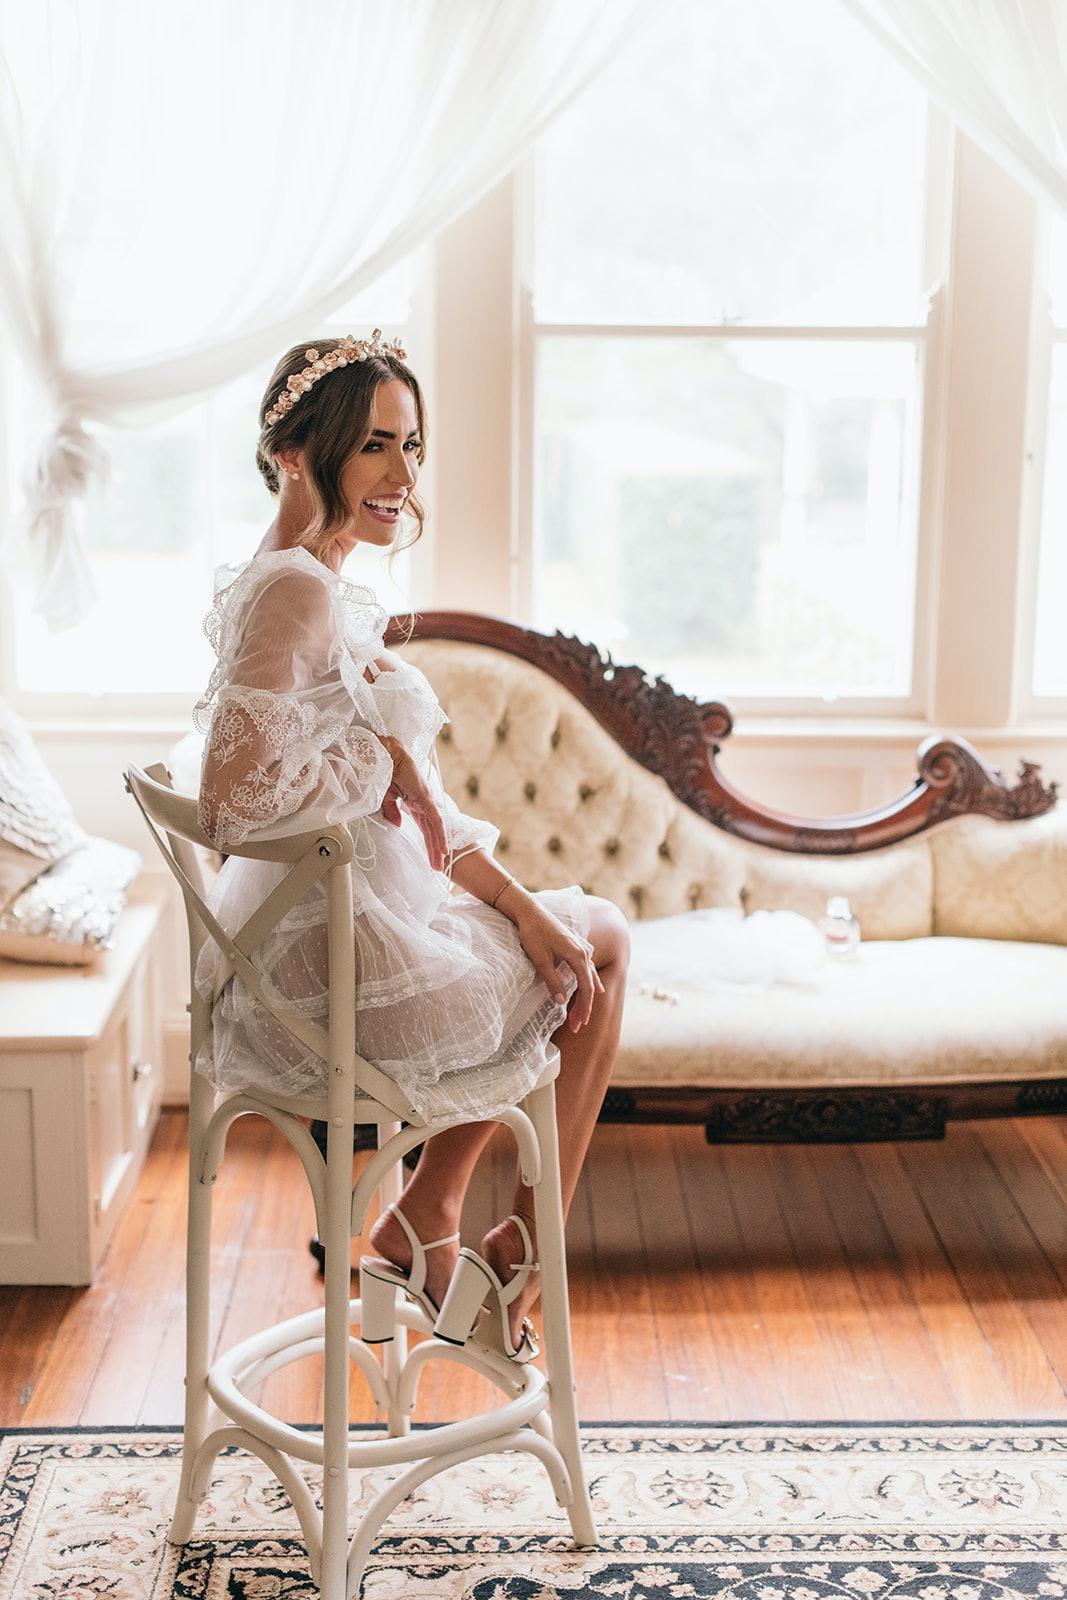 Bride sitting in chair